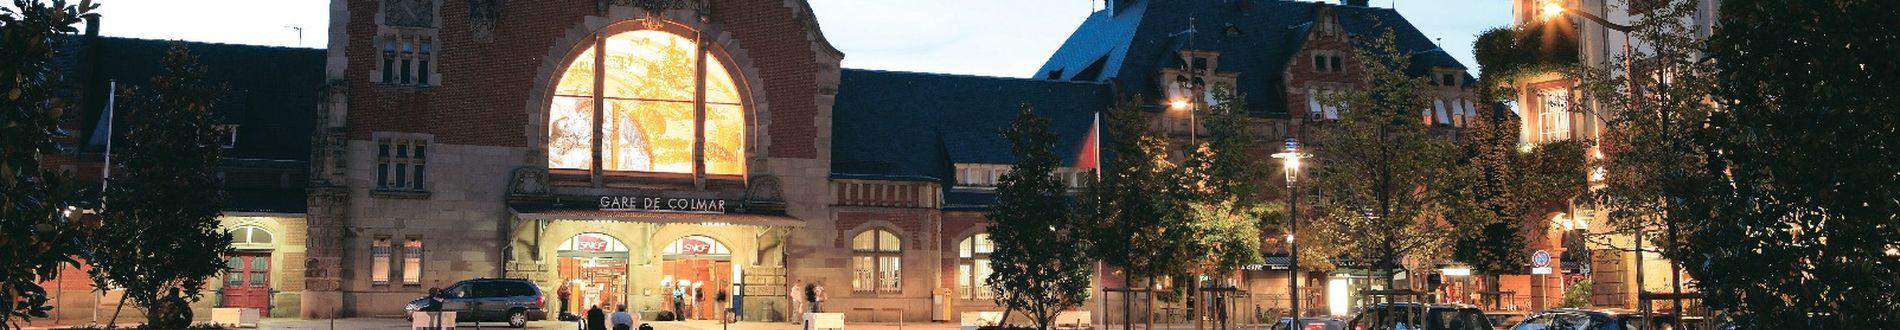 Best western grand hôtel bristol à Colmar